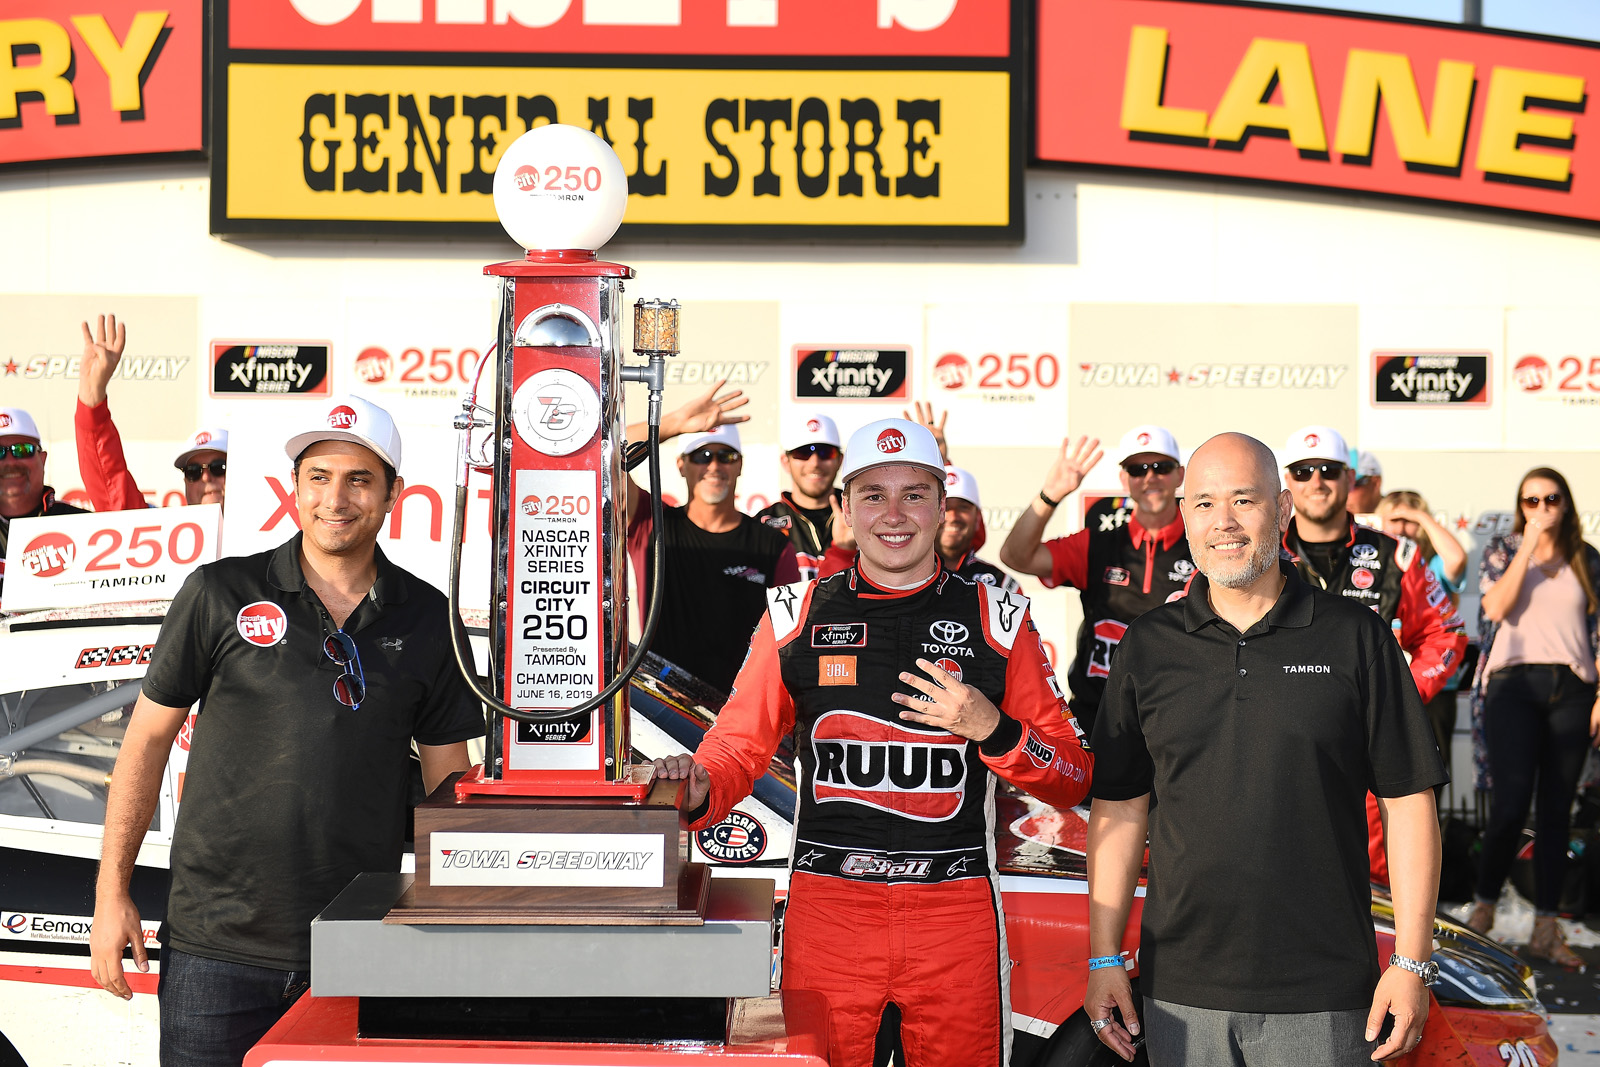 NASCAR Xfinity Series CircuitCity.com 250 Presented by Tamron